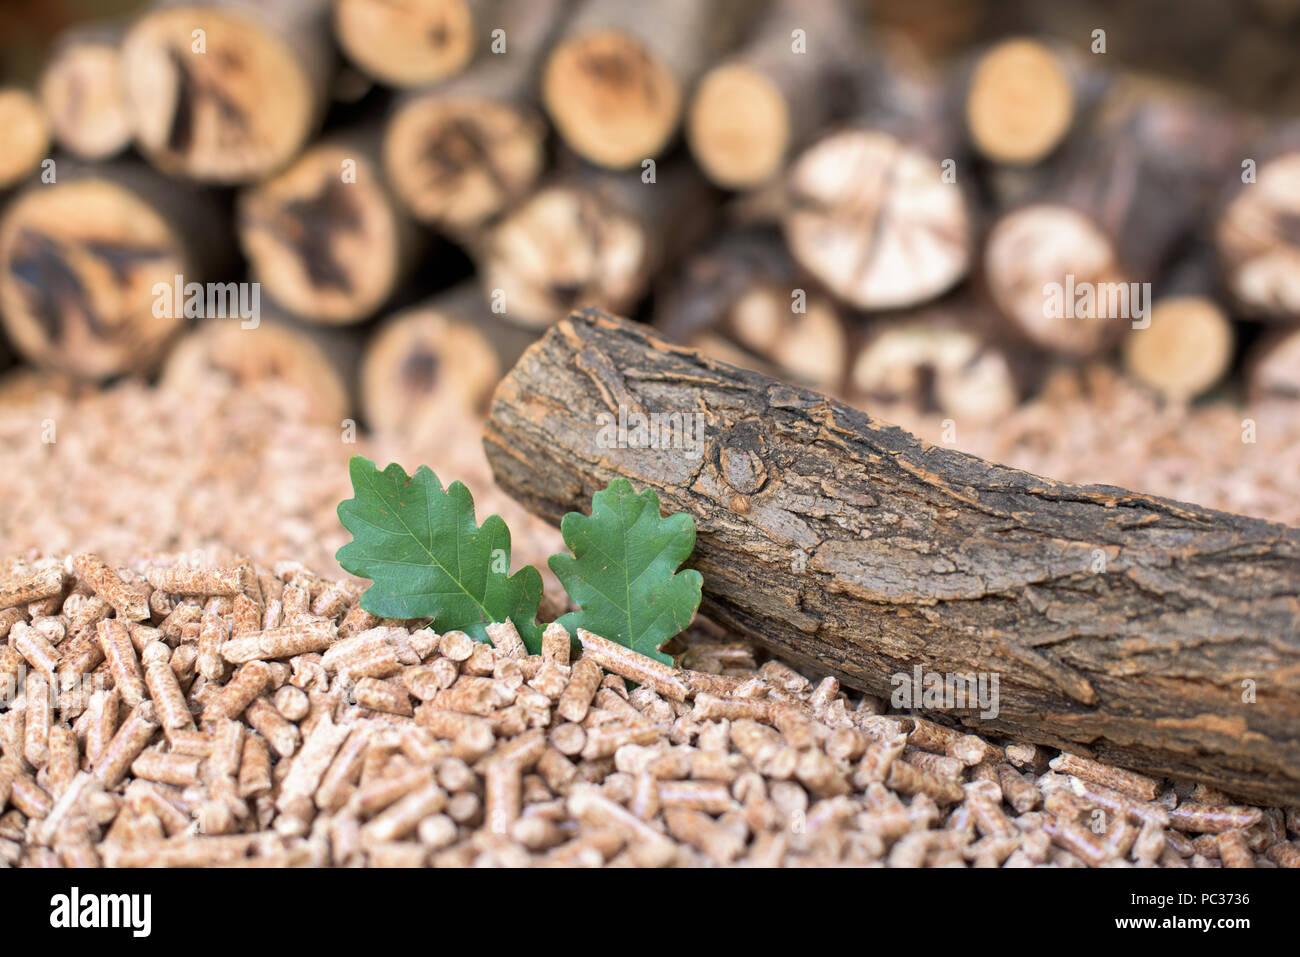 Pile of Oak biomass - pellets, wood, leaf - Stock Image